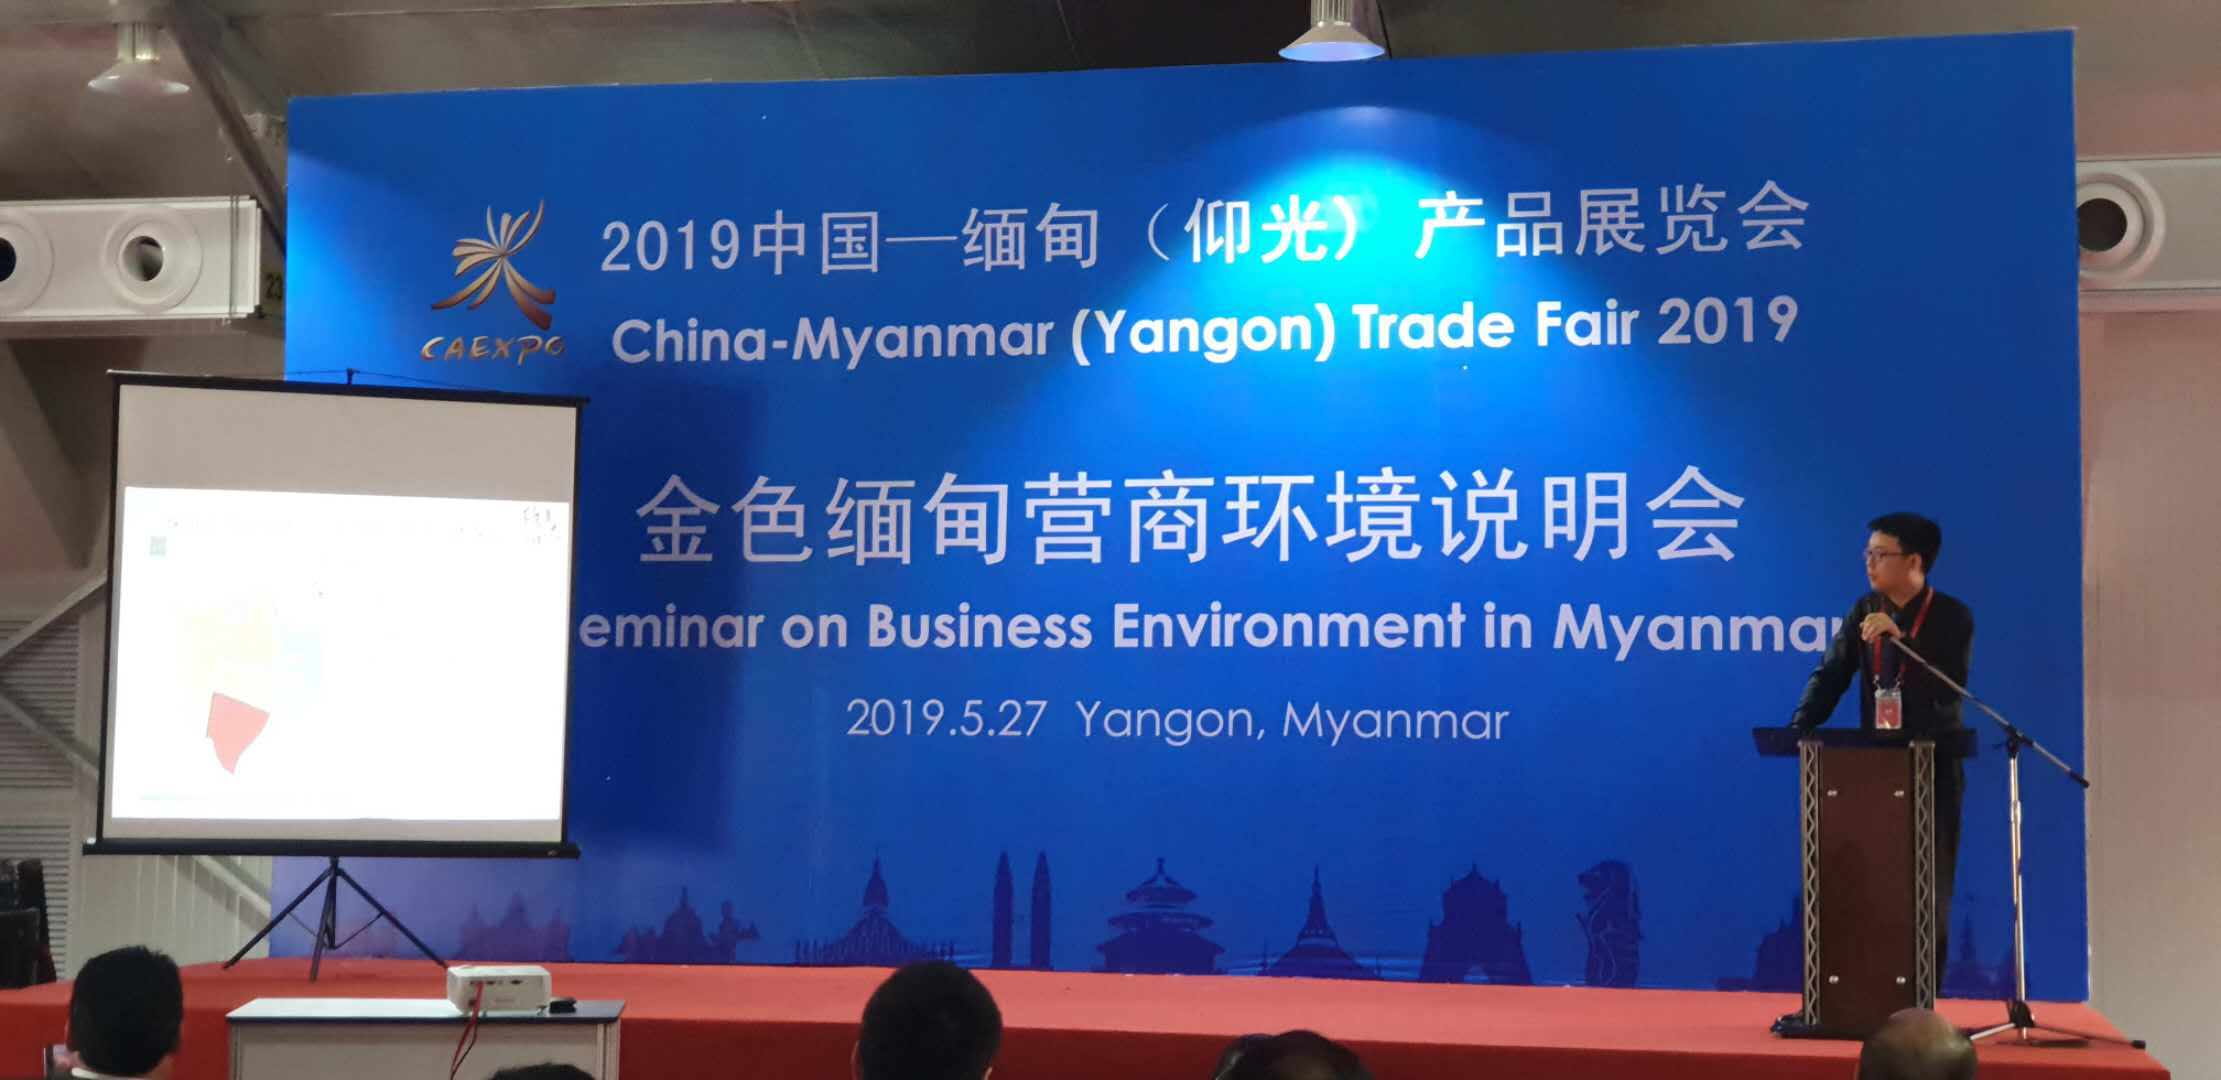 China-Myanmar (Yangon) Trade Fair 2019 – MMID Projects